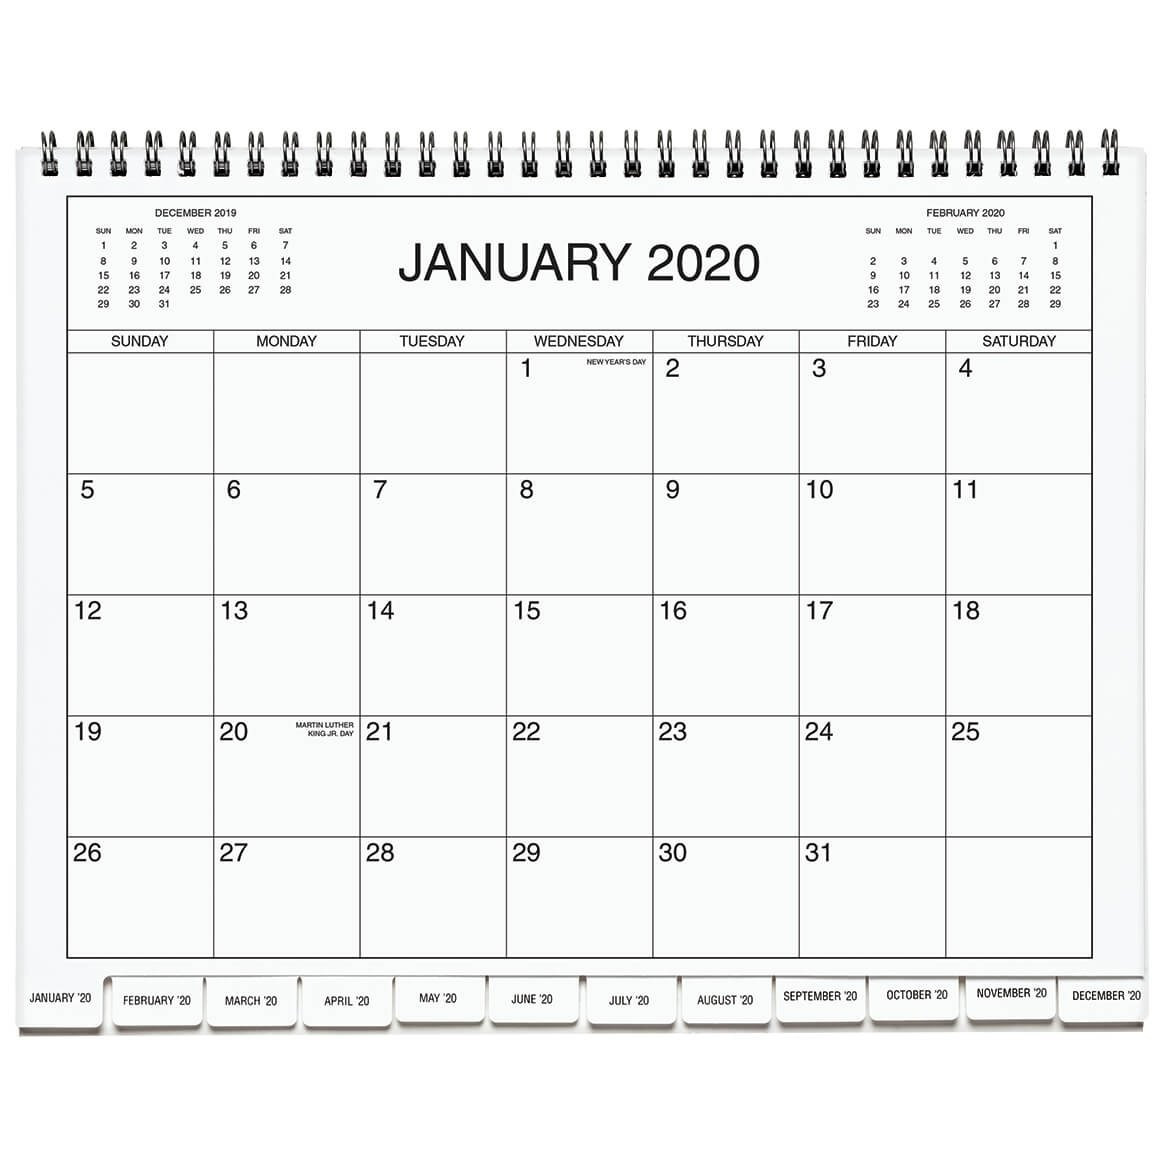 5 Year Calendar 2020 To 2020 | Month Calendar Printable Free Printable 5 Year Calendar